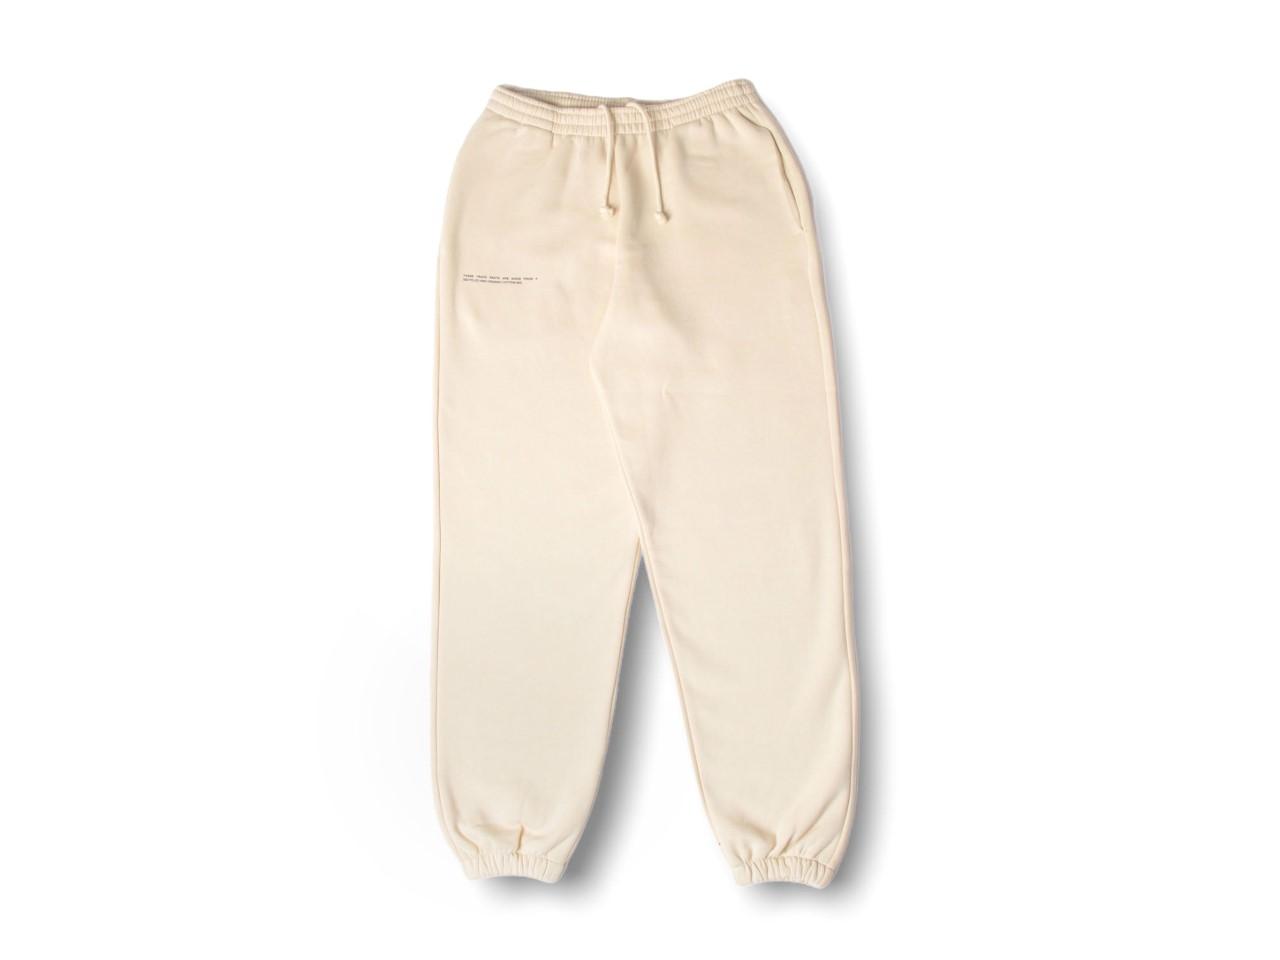 slide 1 - Heavyweight Cotton Track Pants - Sand